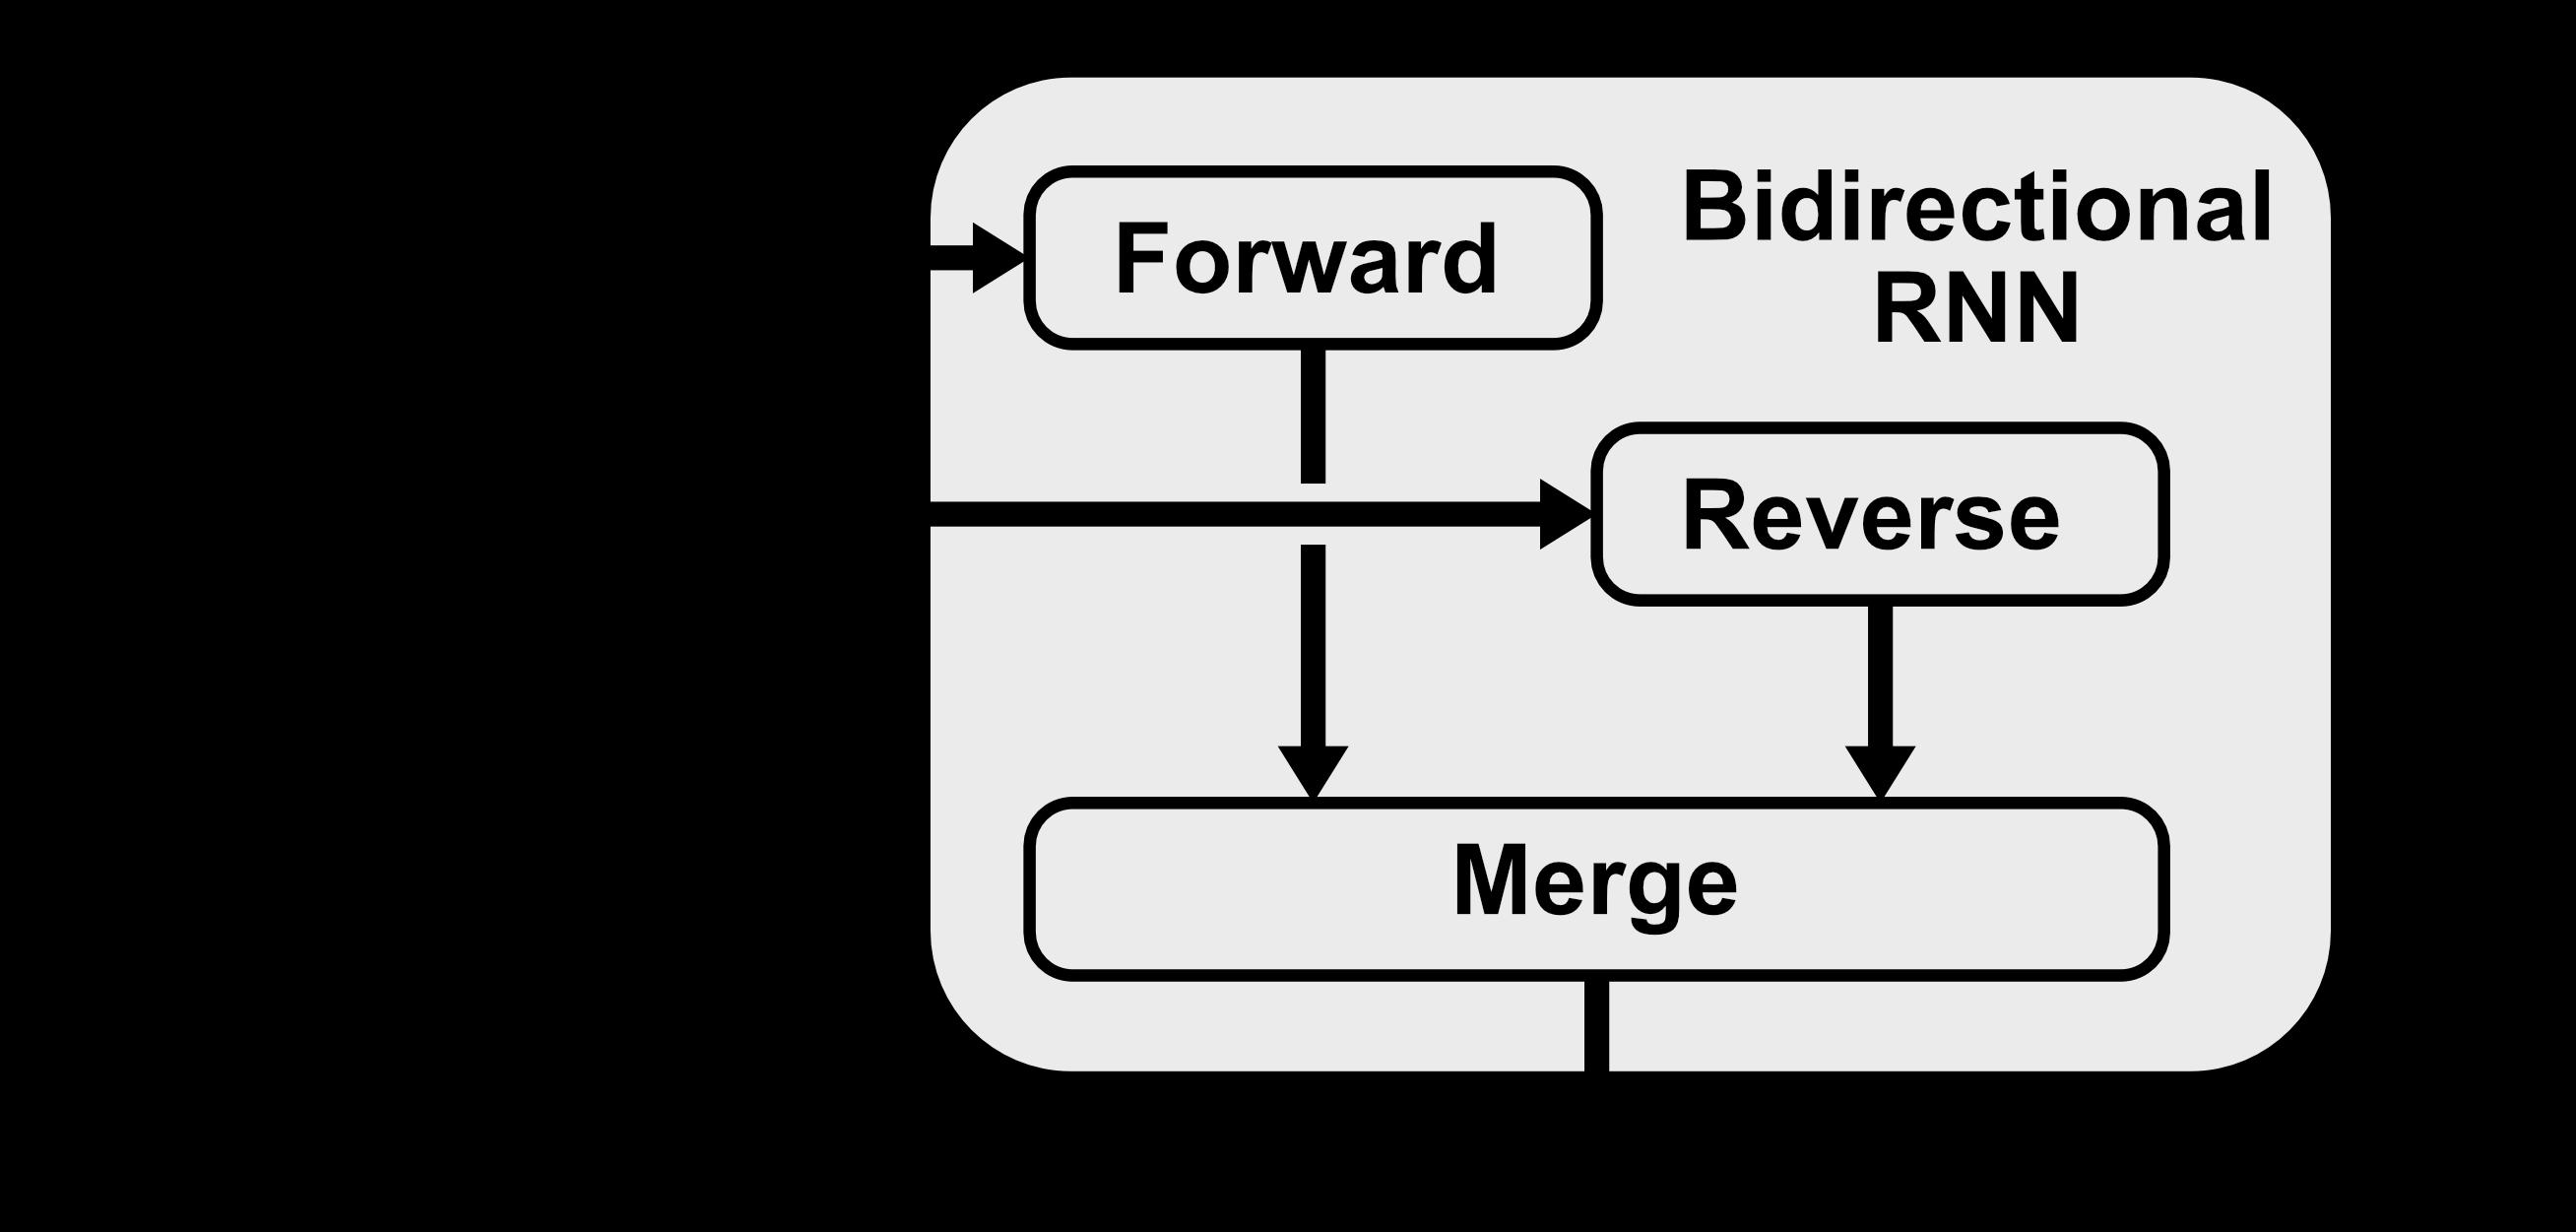 Bidirectional RNN